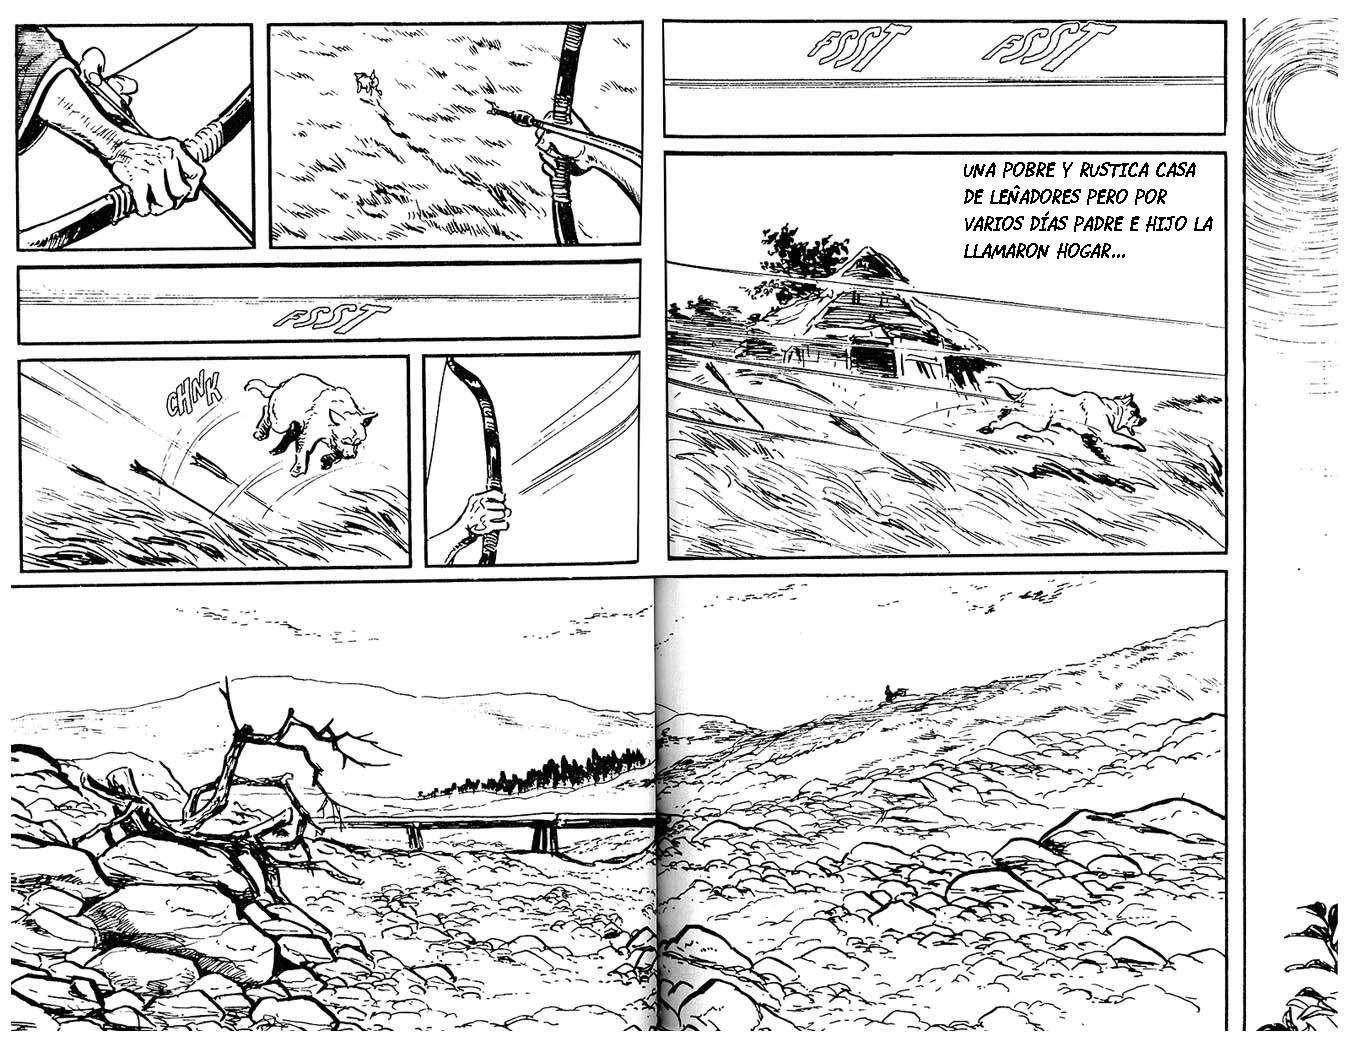 https://c5.ninemanga.com/es_manga/36/18212/424485/abe7868349df7ee546f08c7b17837400.jpg Page 11